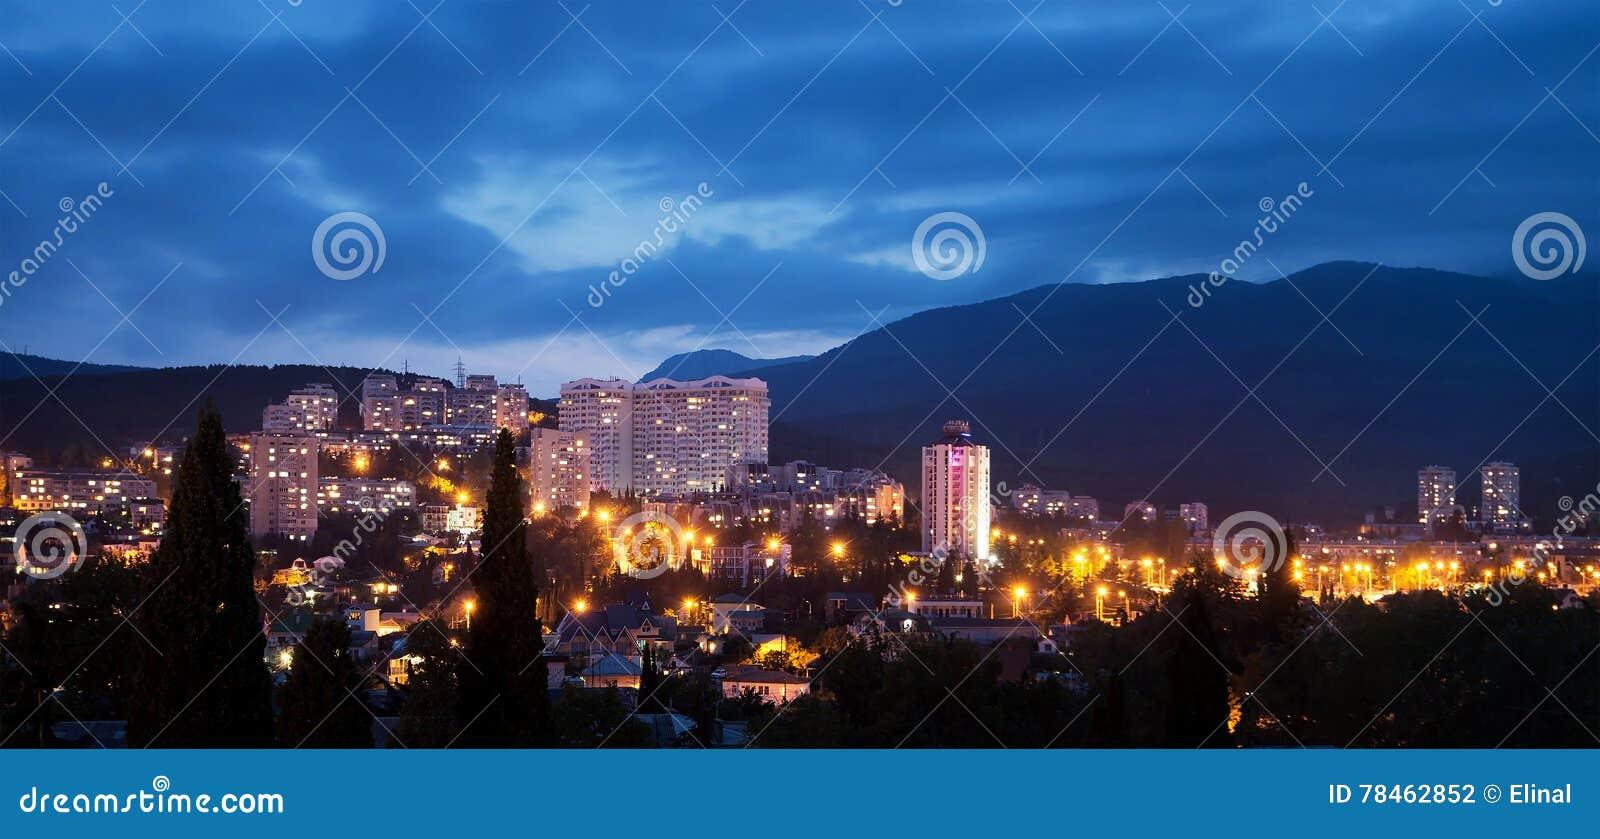 Alushta en la noche, crepúsculo Paisaje urbano crimea